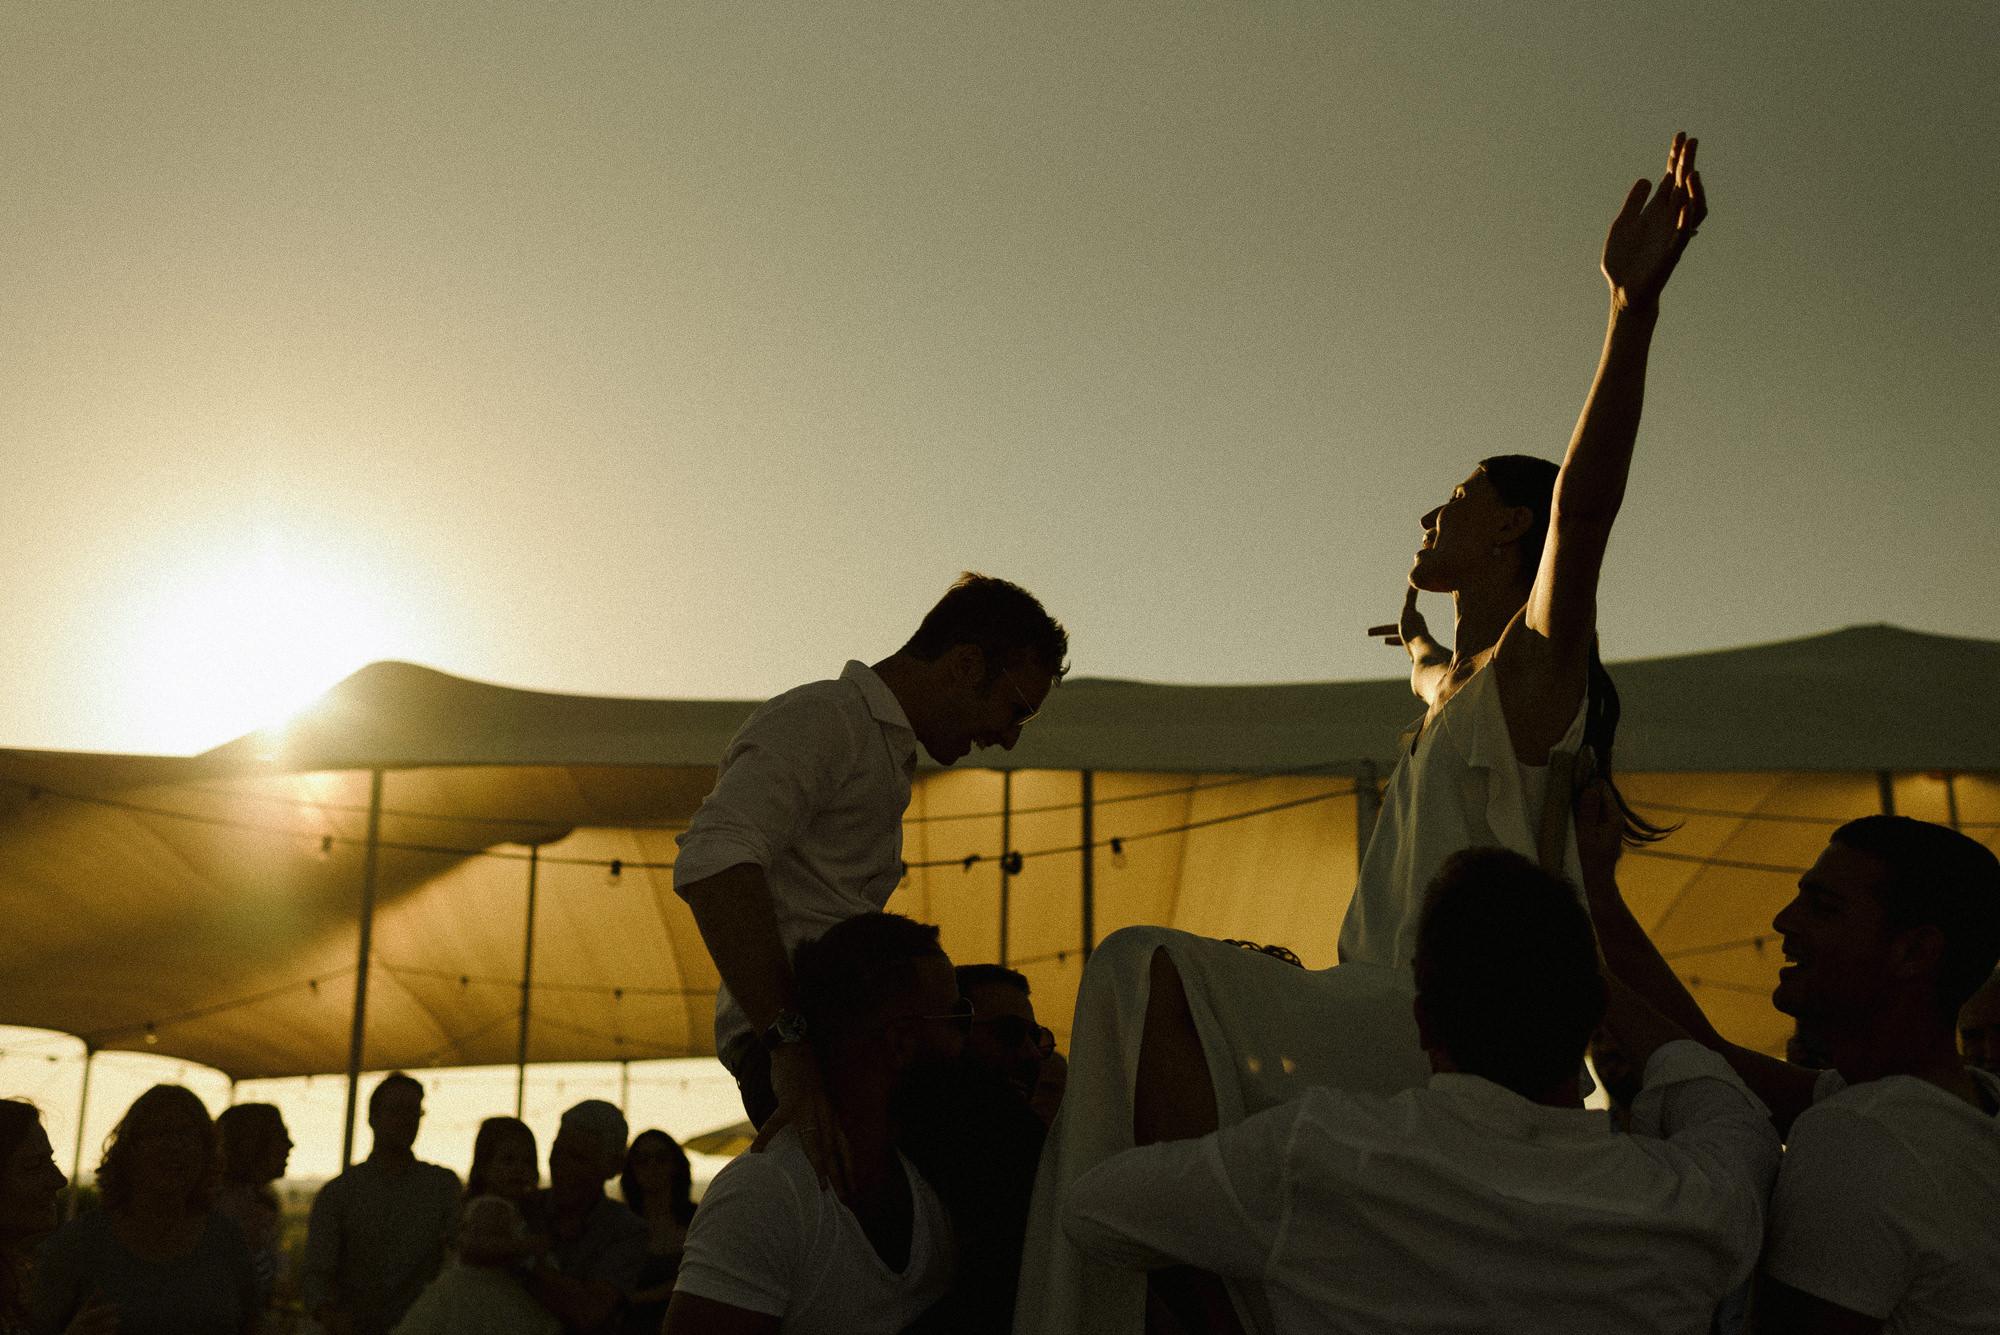 Joyful horah at sunset, photo by Thierry Joubert